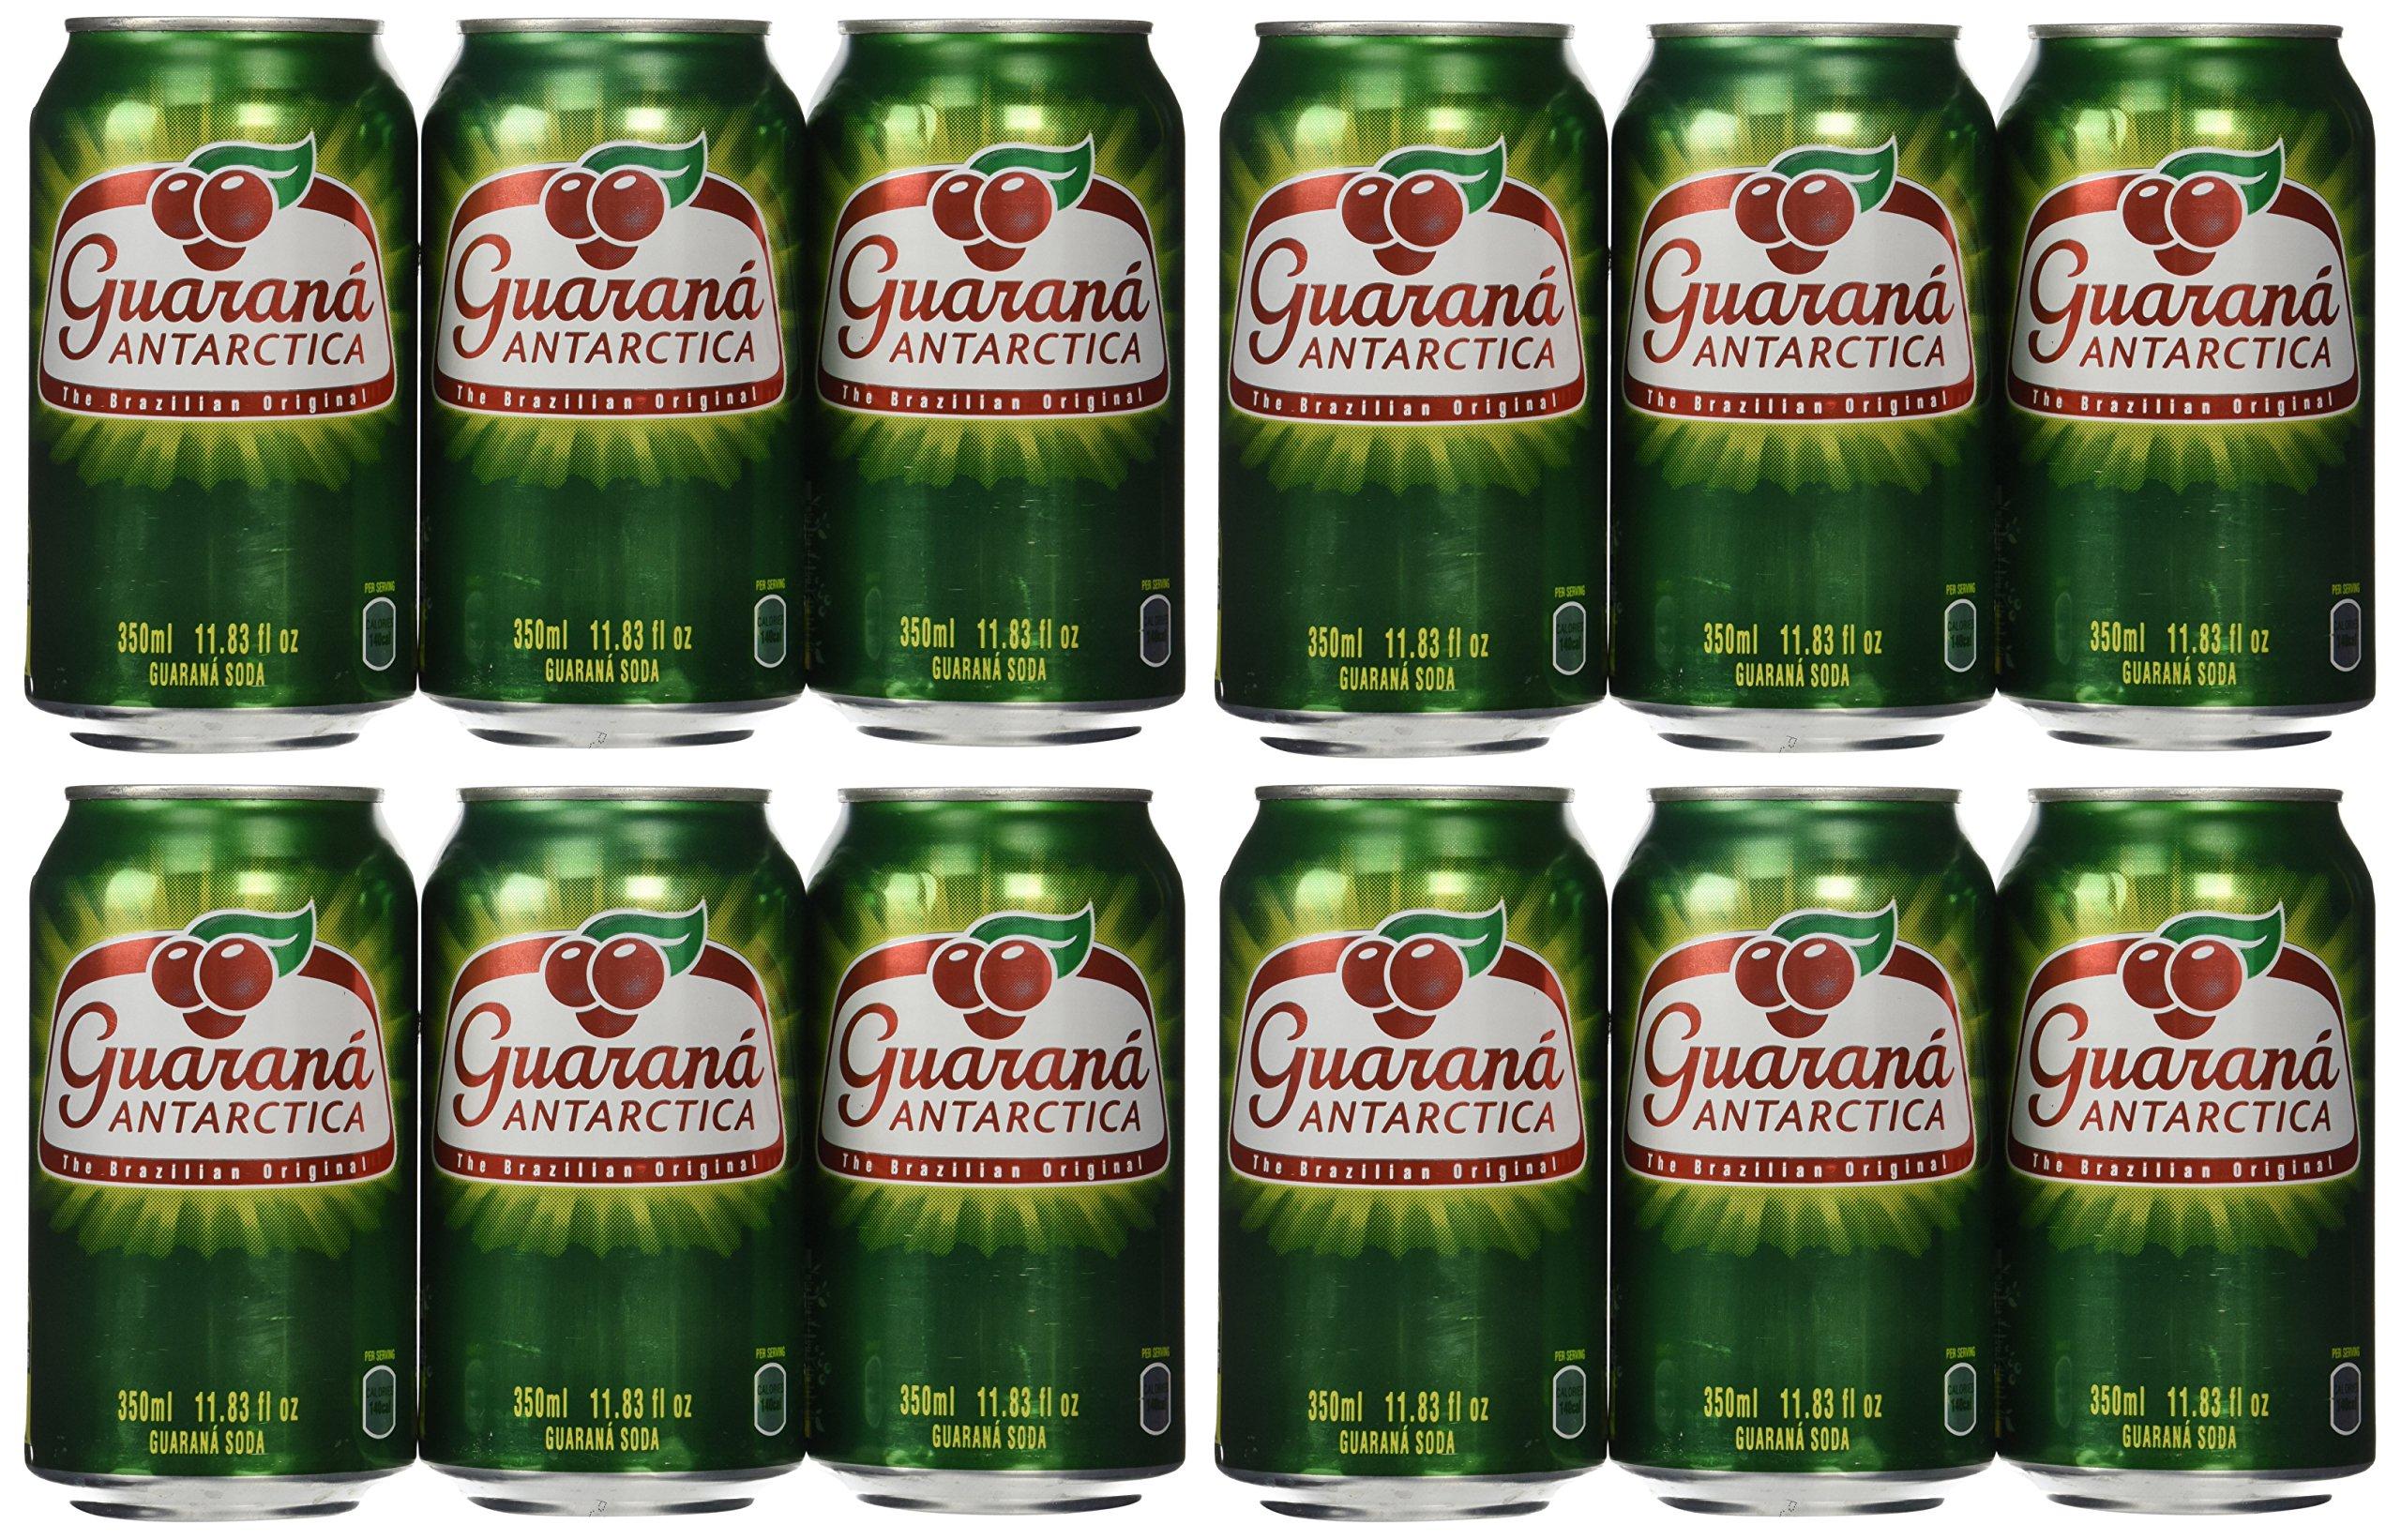 Guarana Antarctica 350ml (Pack of 12)